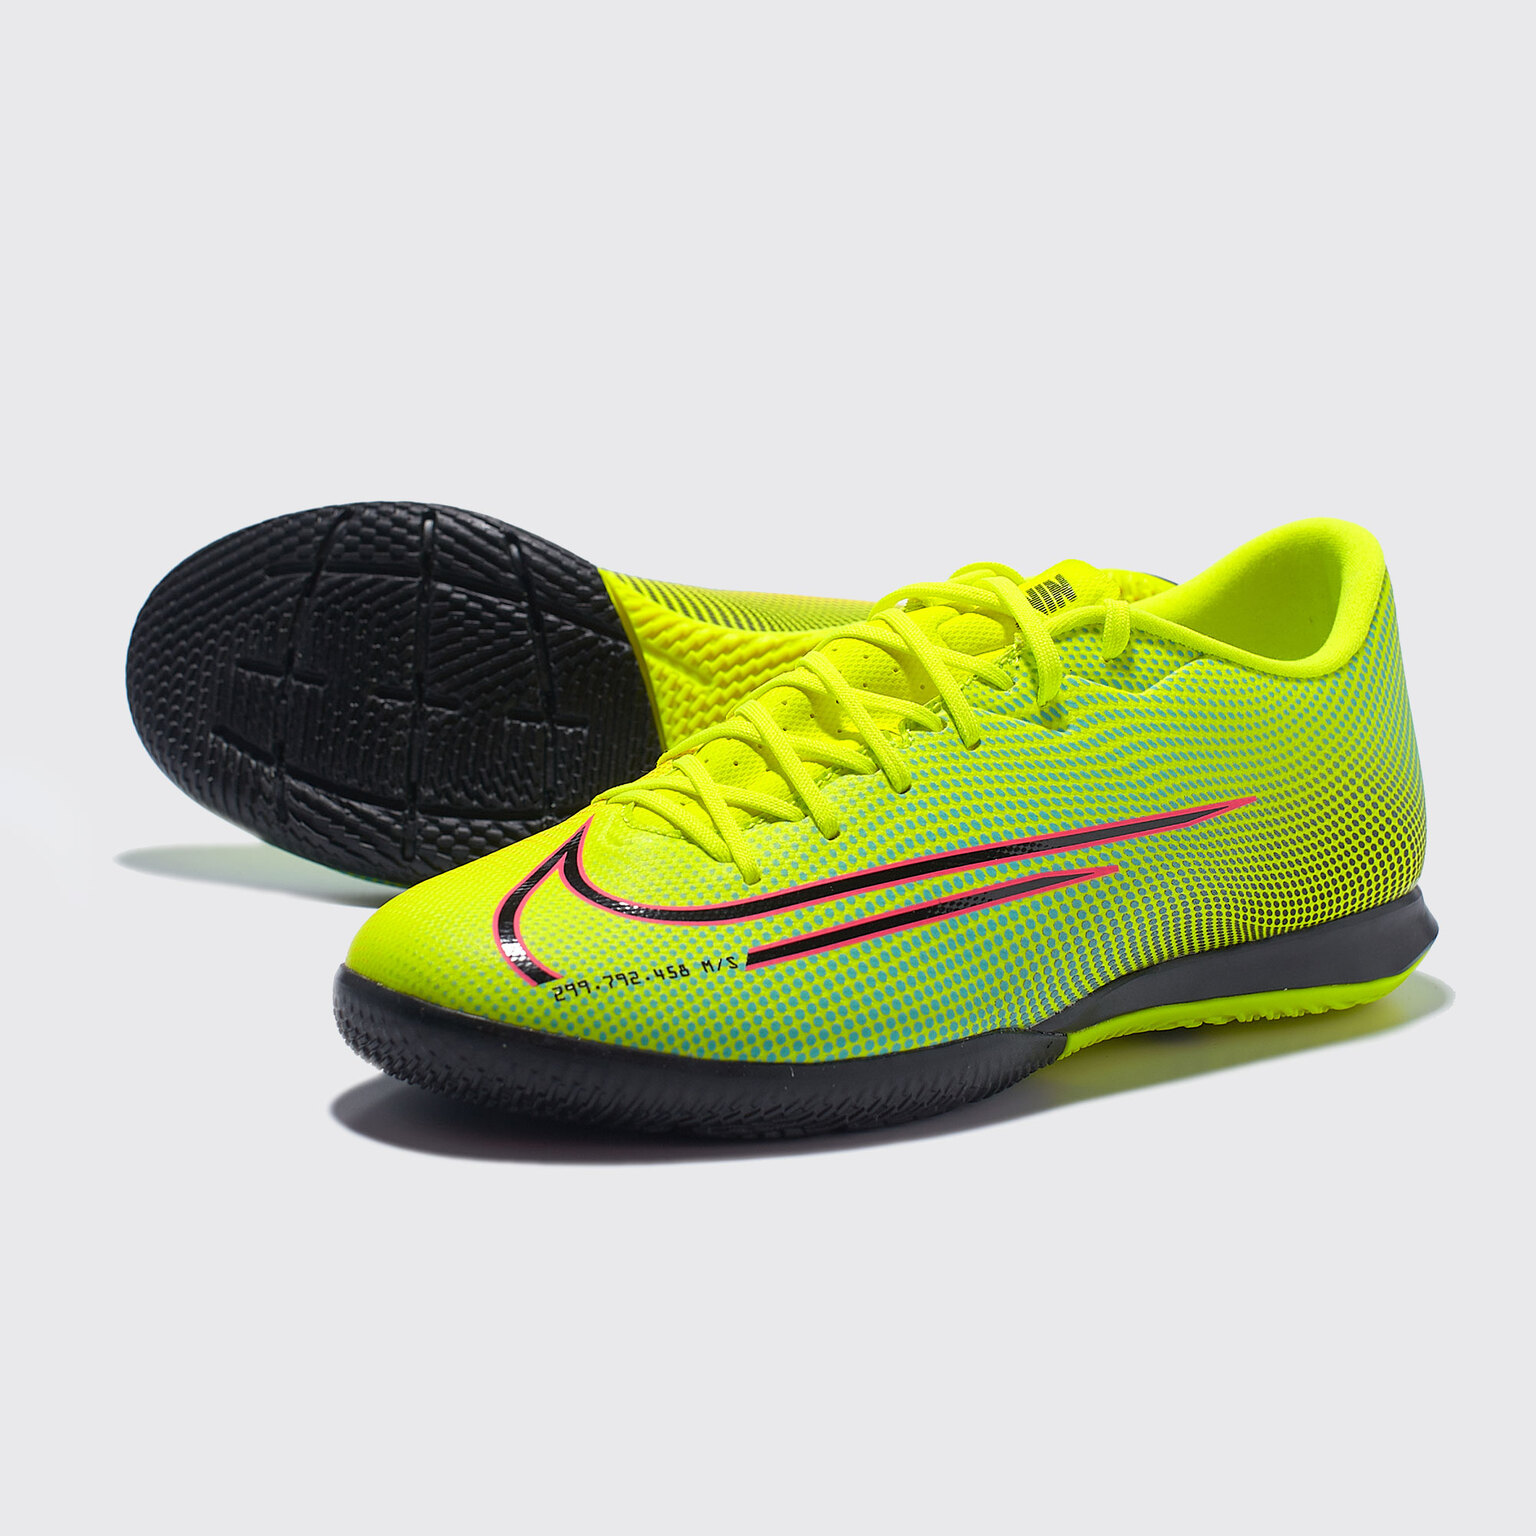 Футзалки Nike Vapor 13 Academy MDS IC CJ1300-703 футзалки nike superflyx 6 academy ic ah7369 701